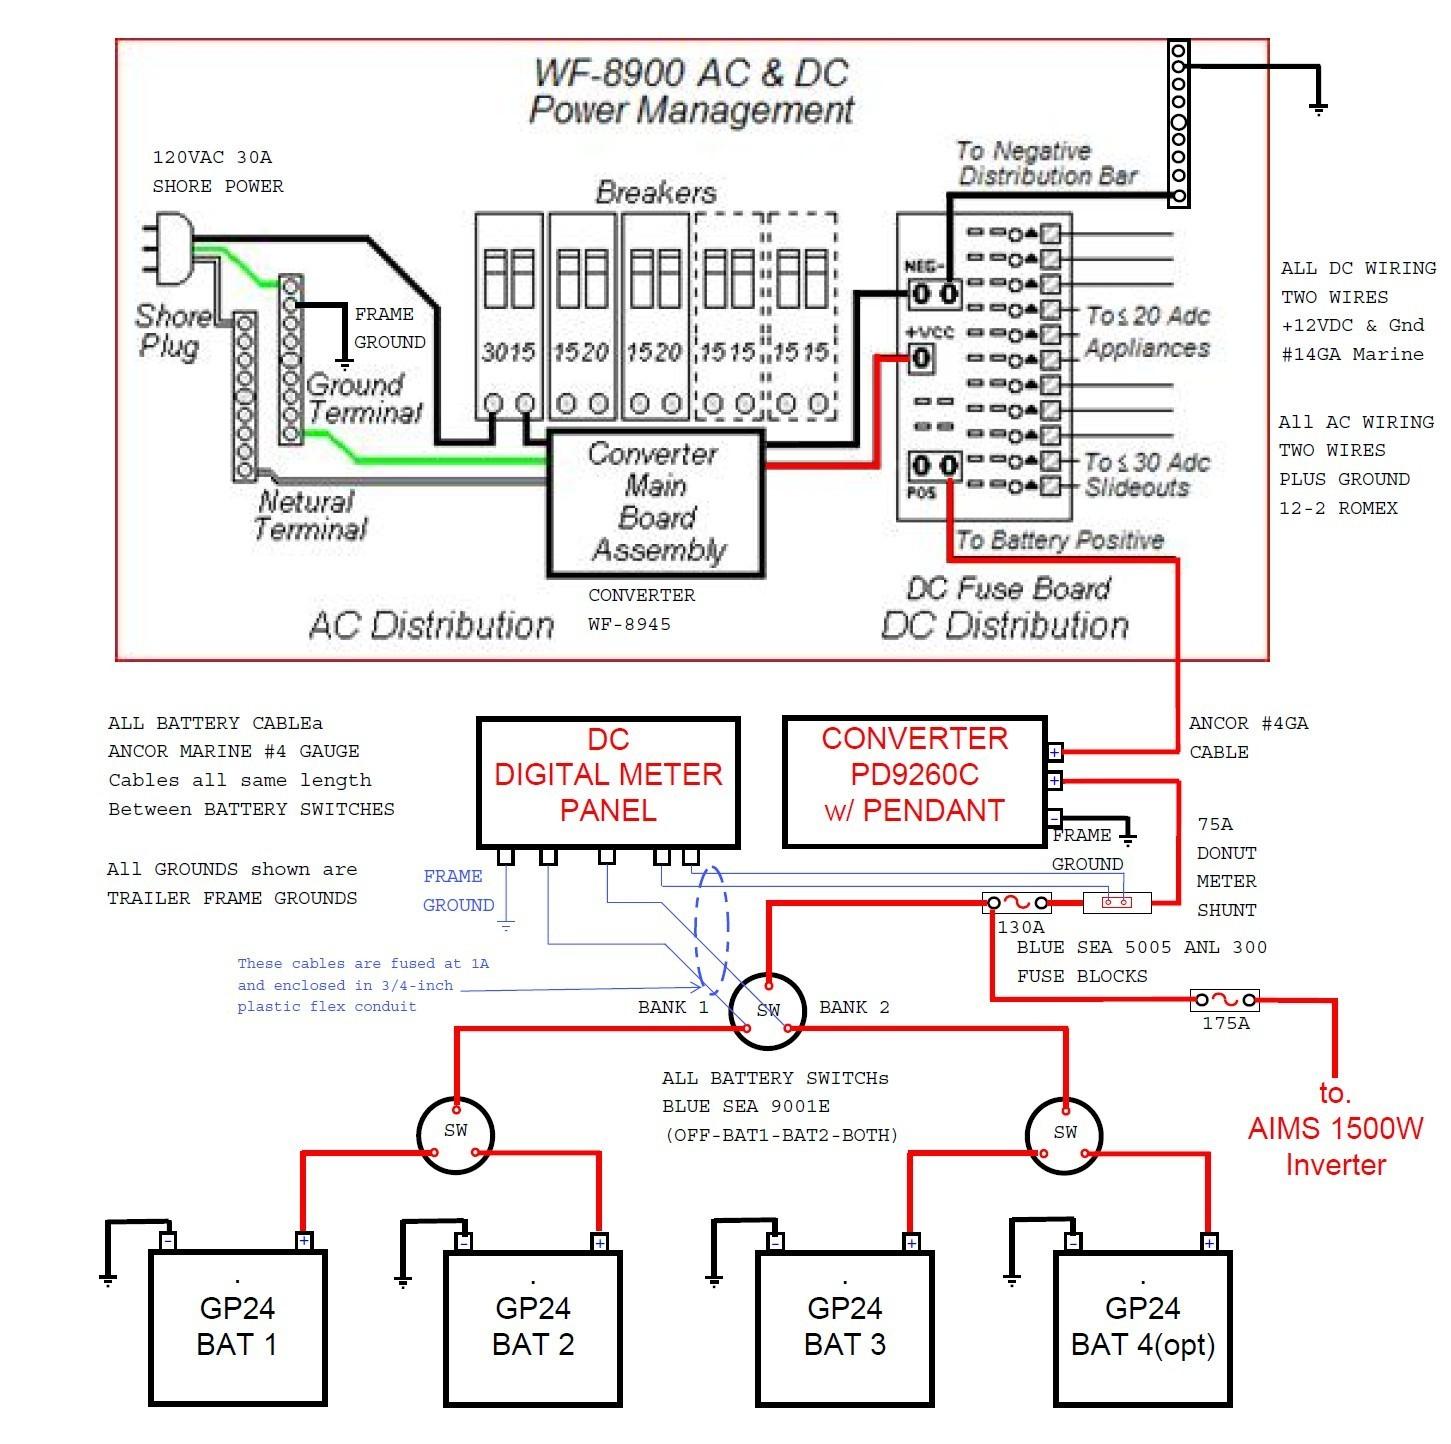 Starcraft Trailer Wiring Diagram - Wiring Diagrams on